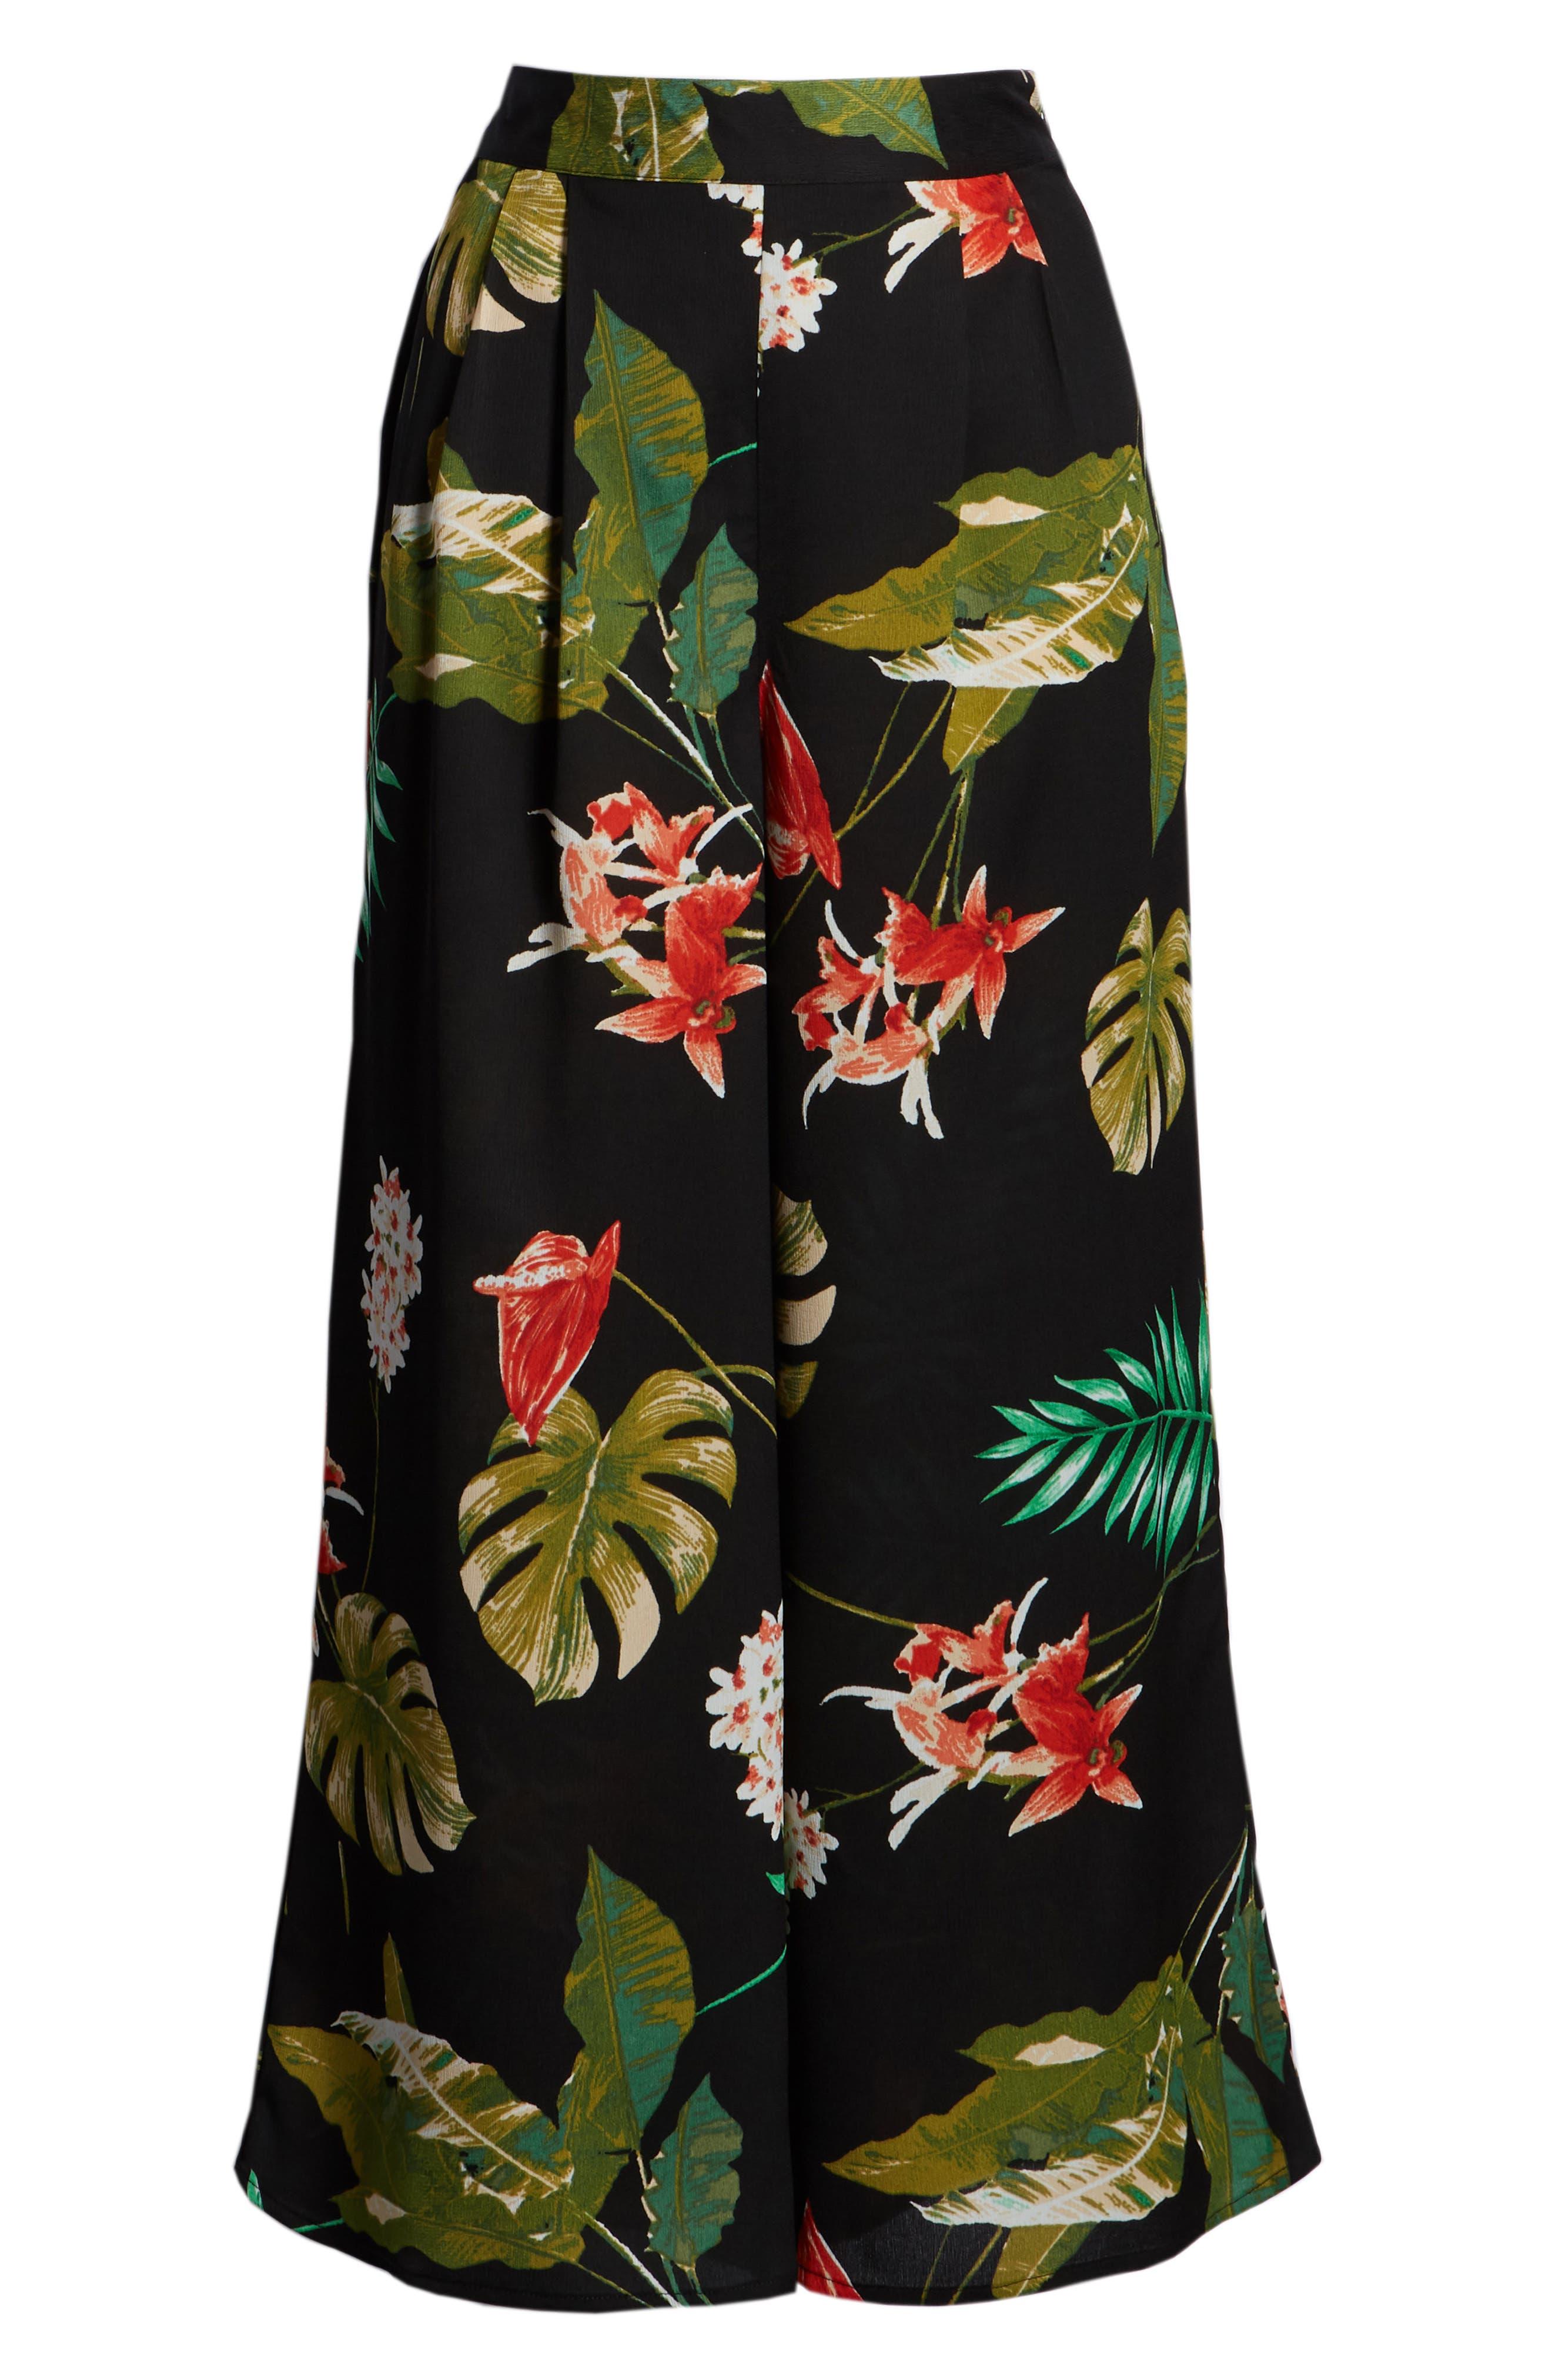 LYDELLE,                             Tropical Print Culottes,                             Alternate thumbnail 7, color,                             001